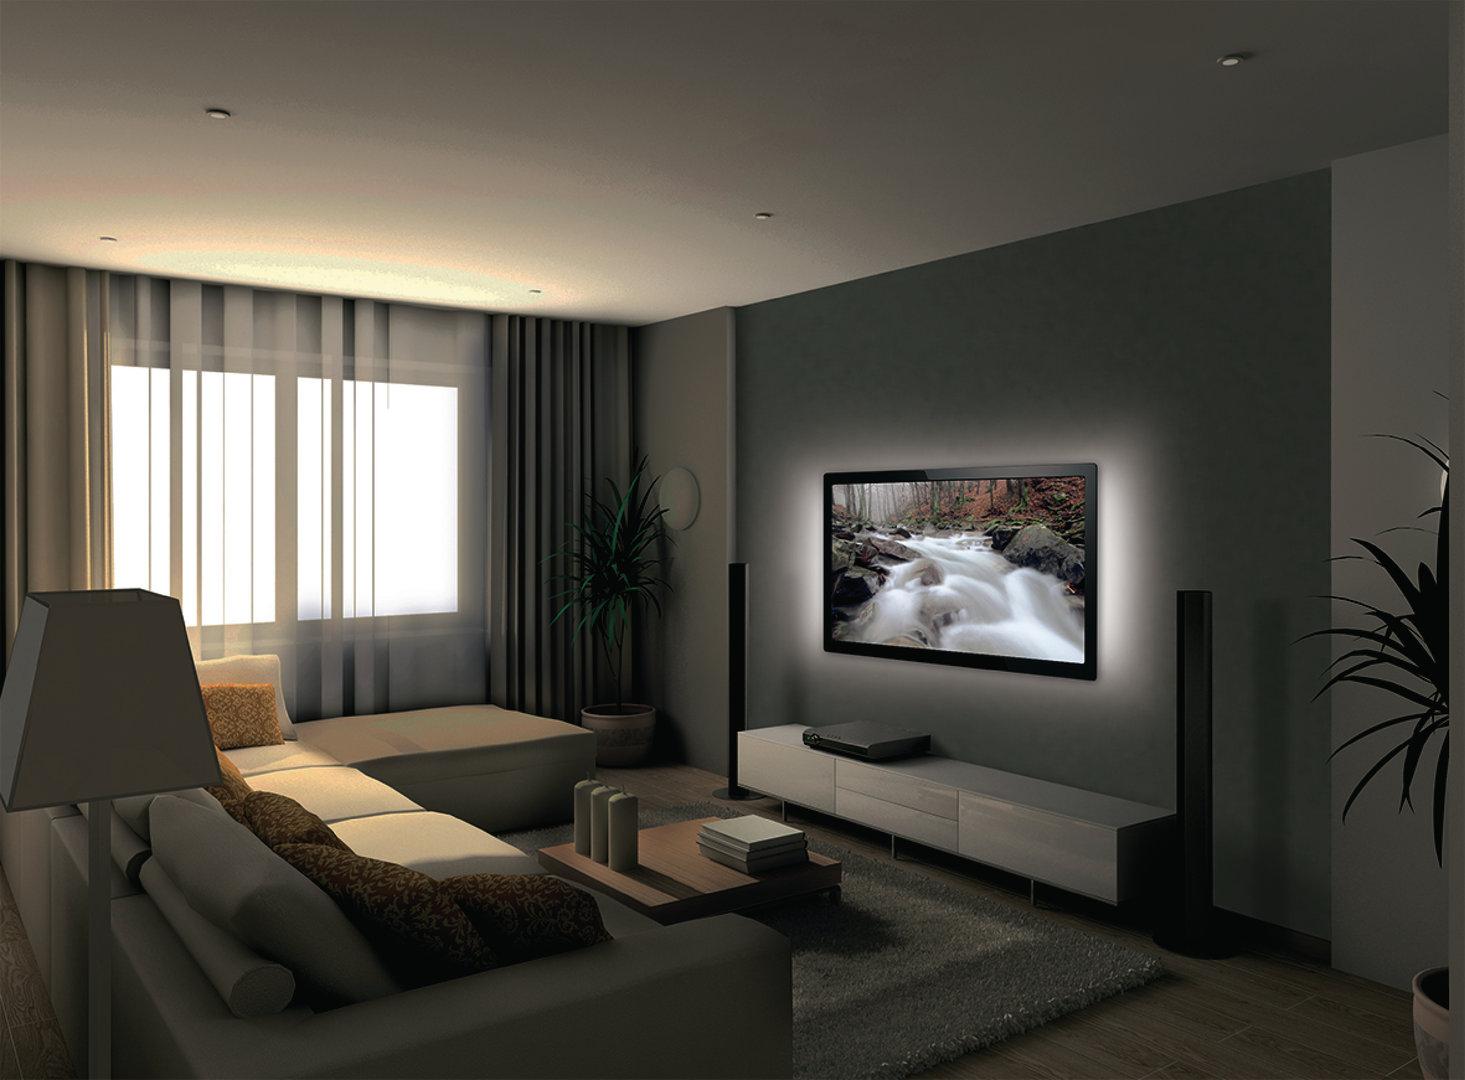 bande led lumineuse pour tv led 192 lm 1800 mm blanc froid. Black Bedroom Furniture Sets. Home Design Ideas